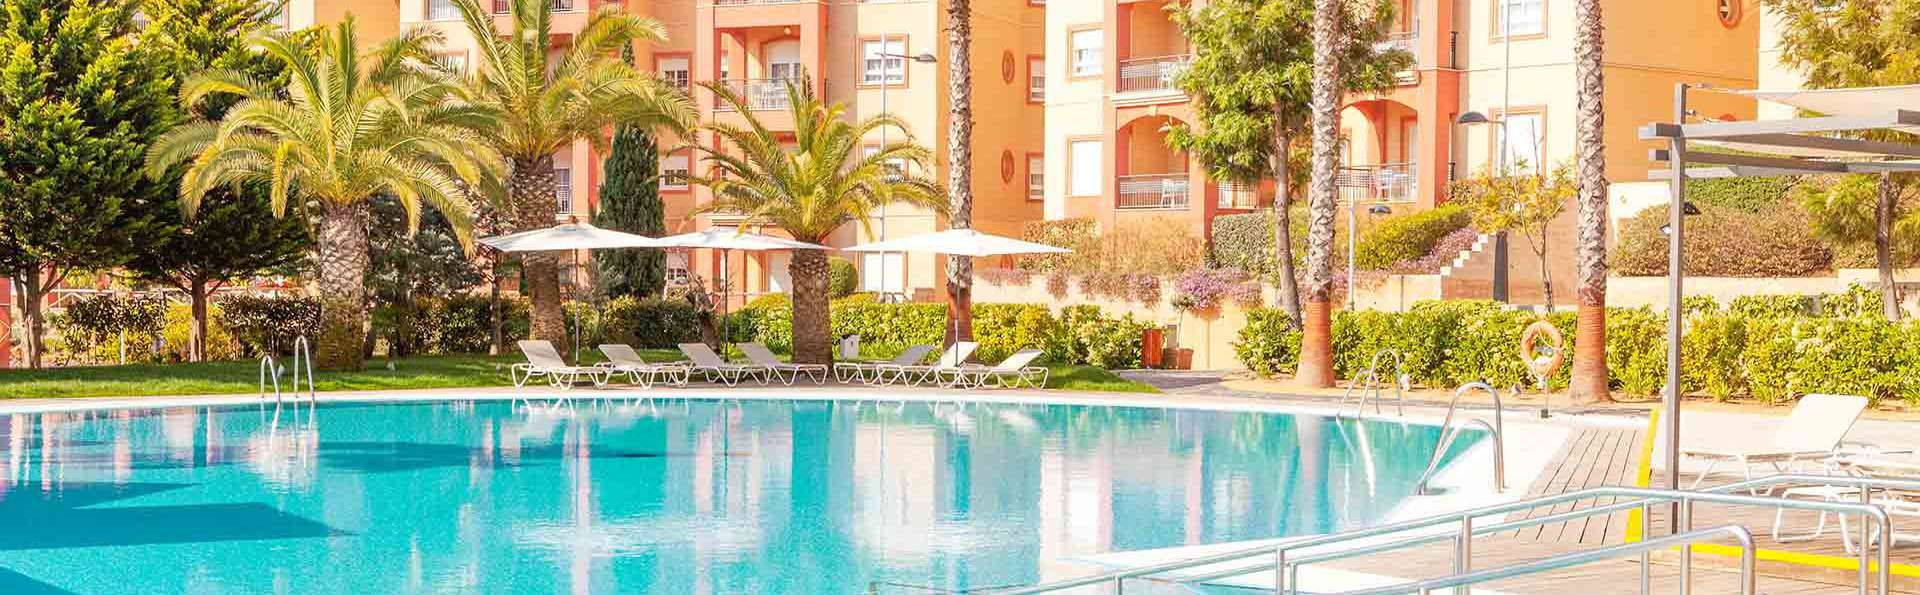 The Residences Islantilla Apartments - EDIT_TRIA-POOL_01.jpg